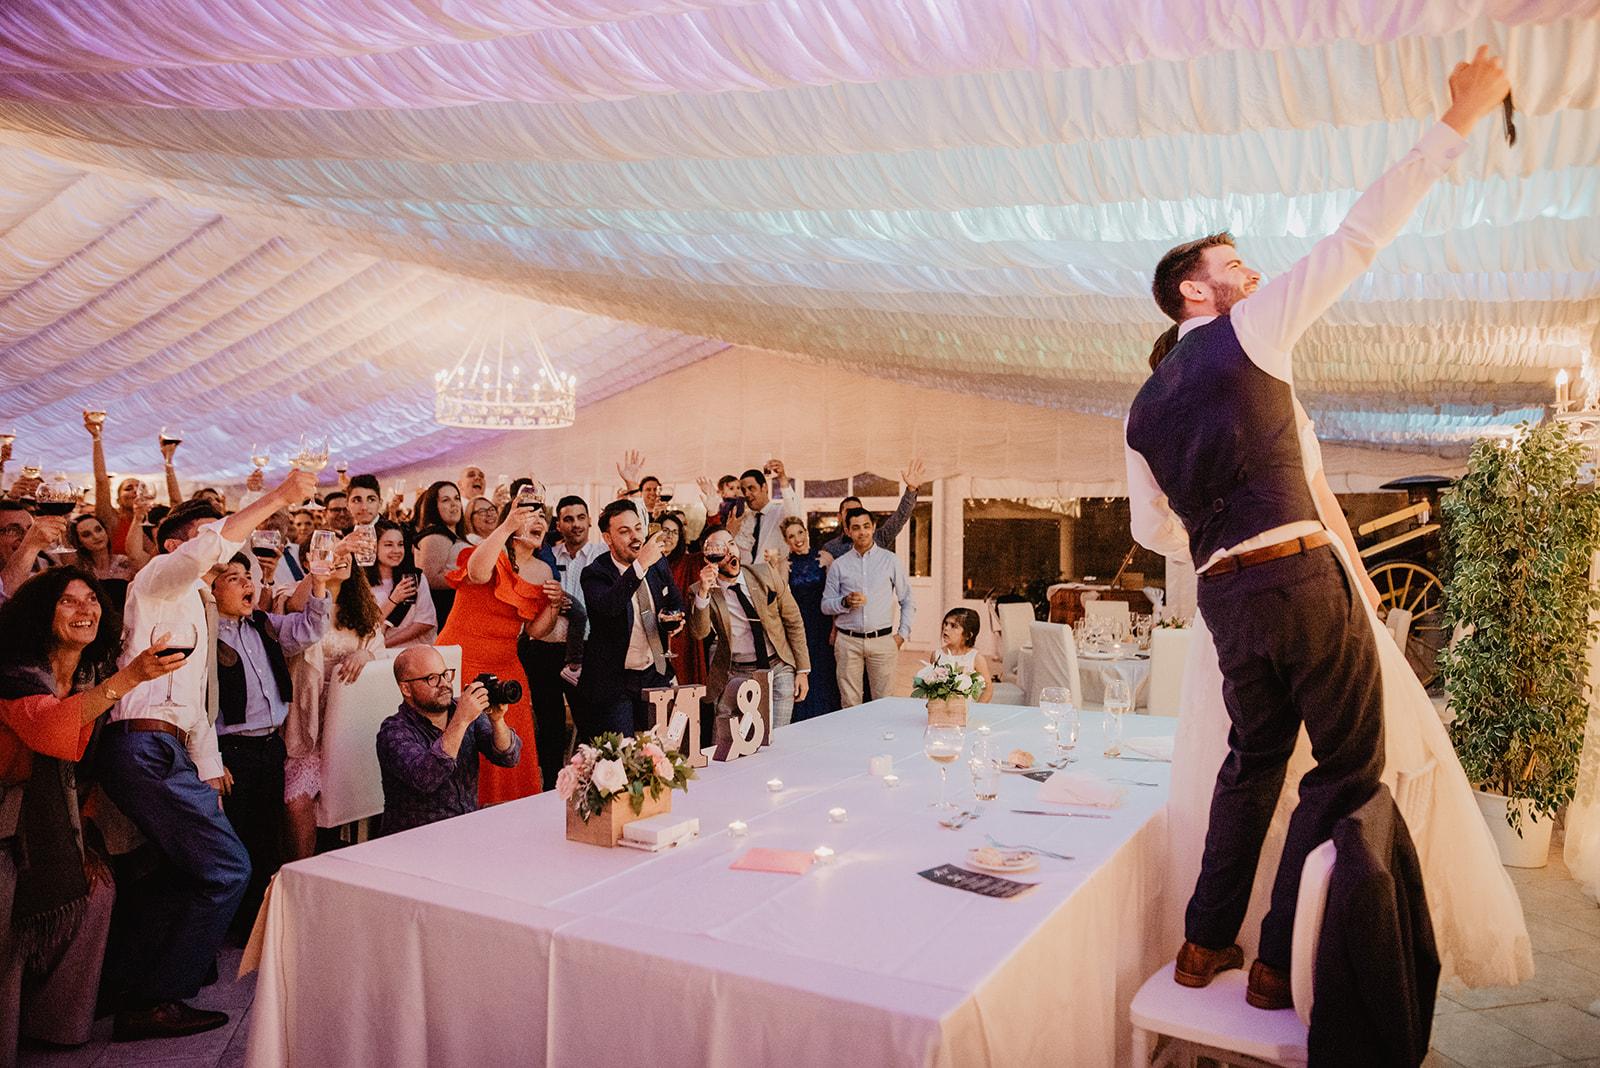 Lapela-photography-wedding-algarve-portugal-best-of-118.jpg